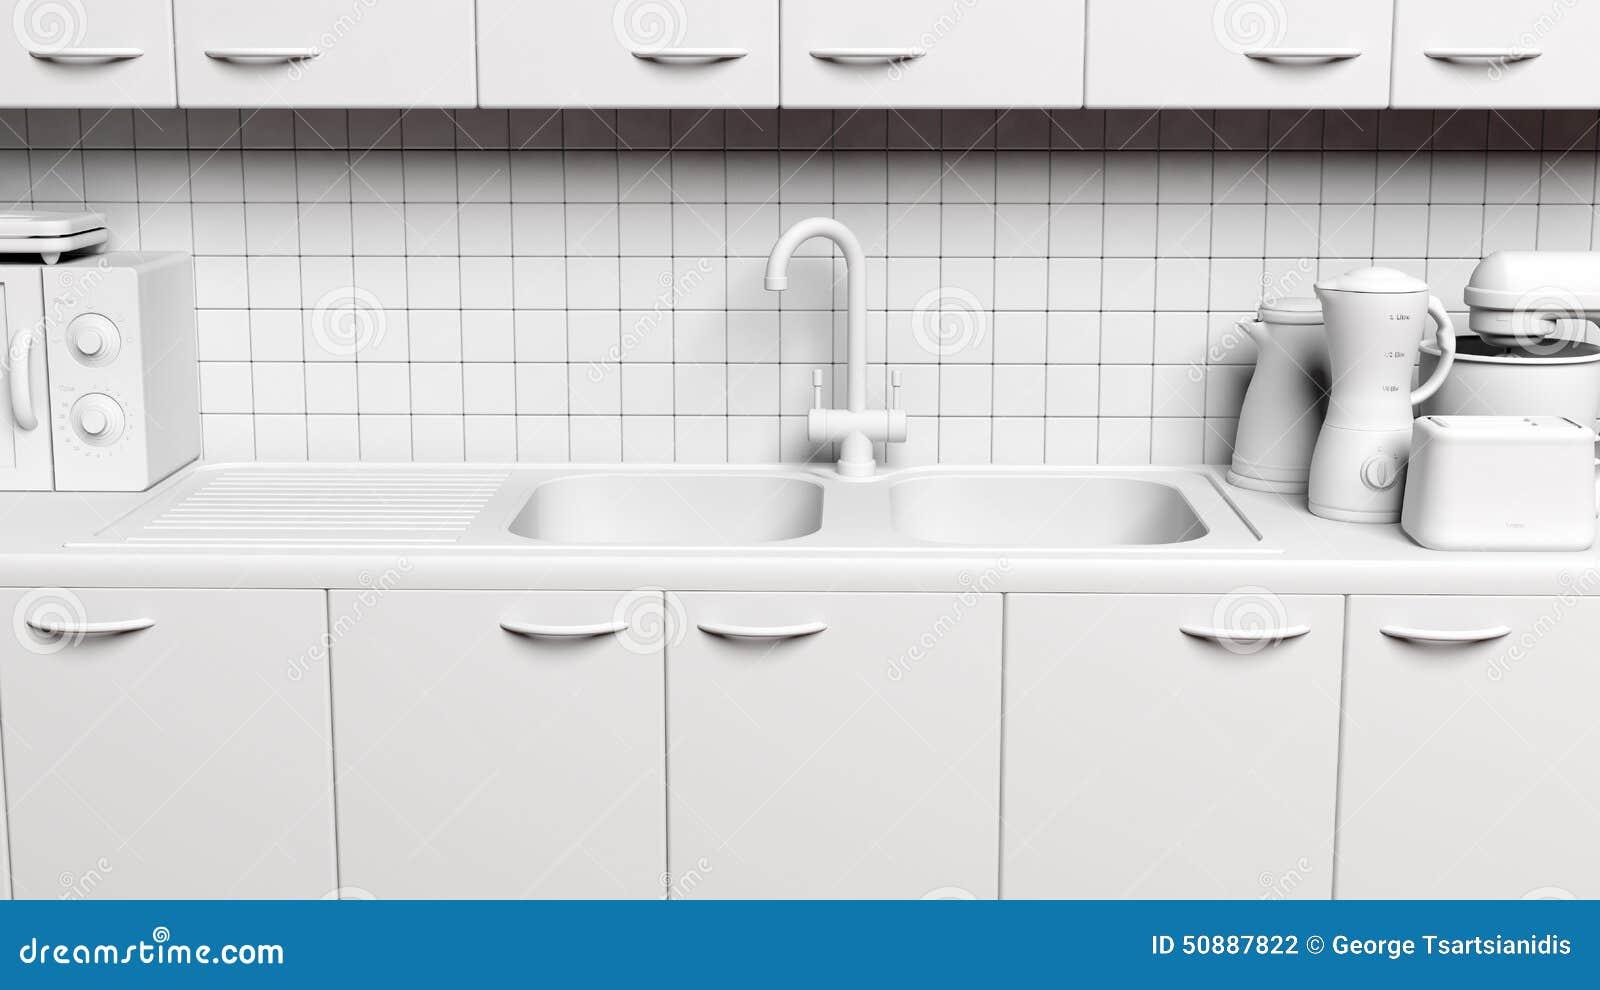 3d Kitchen Cabinet Stock Illustration Image 50887822